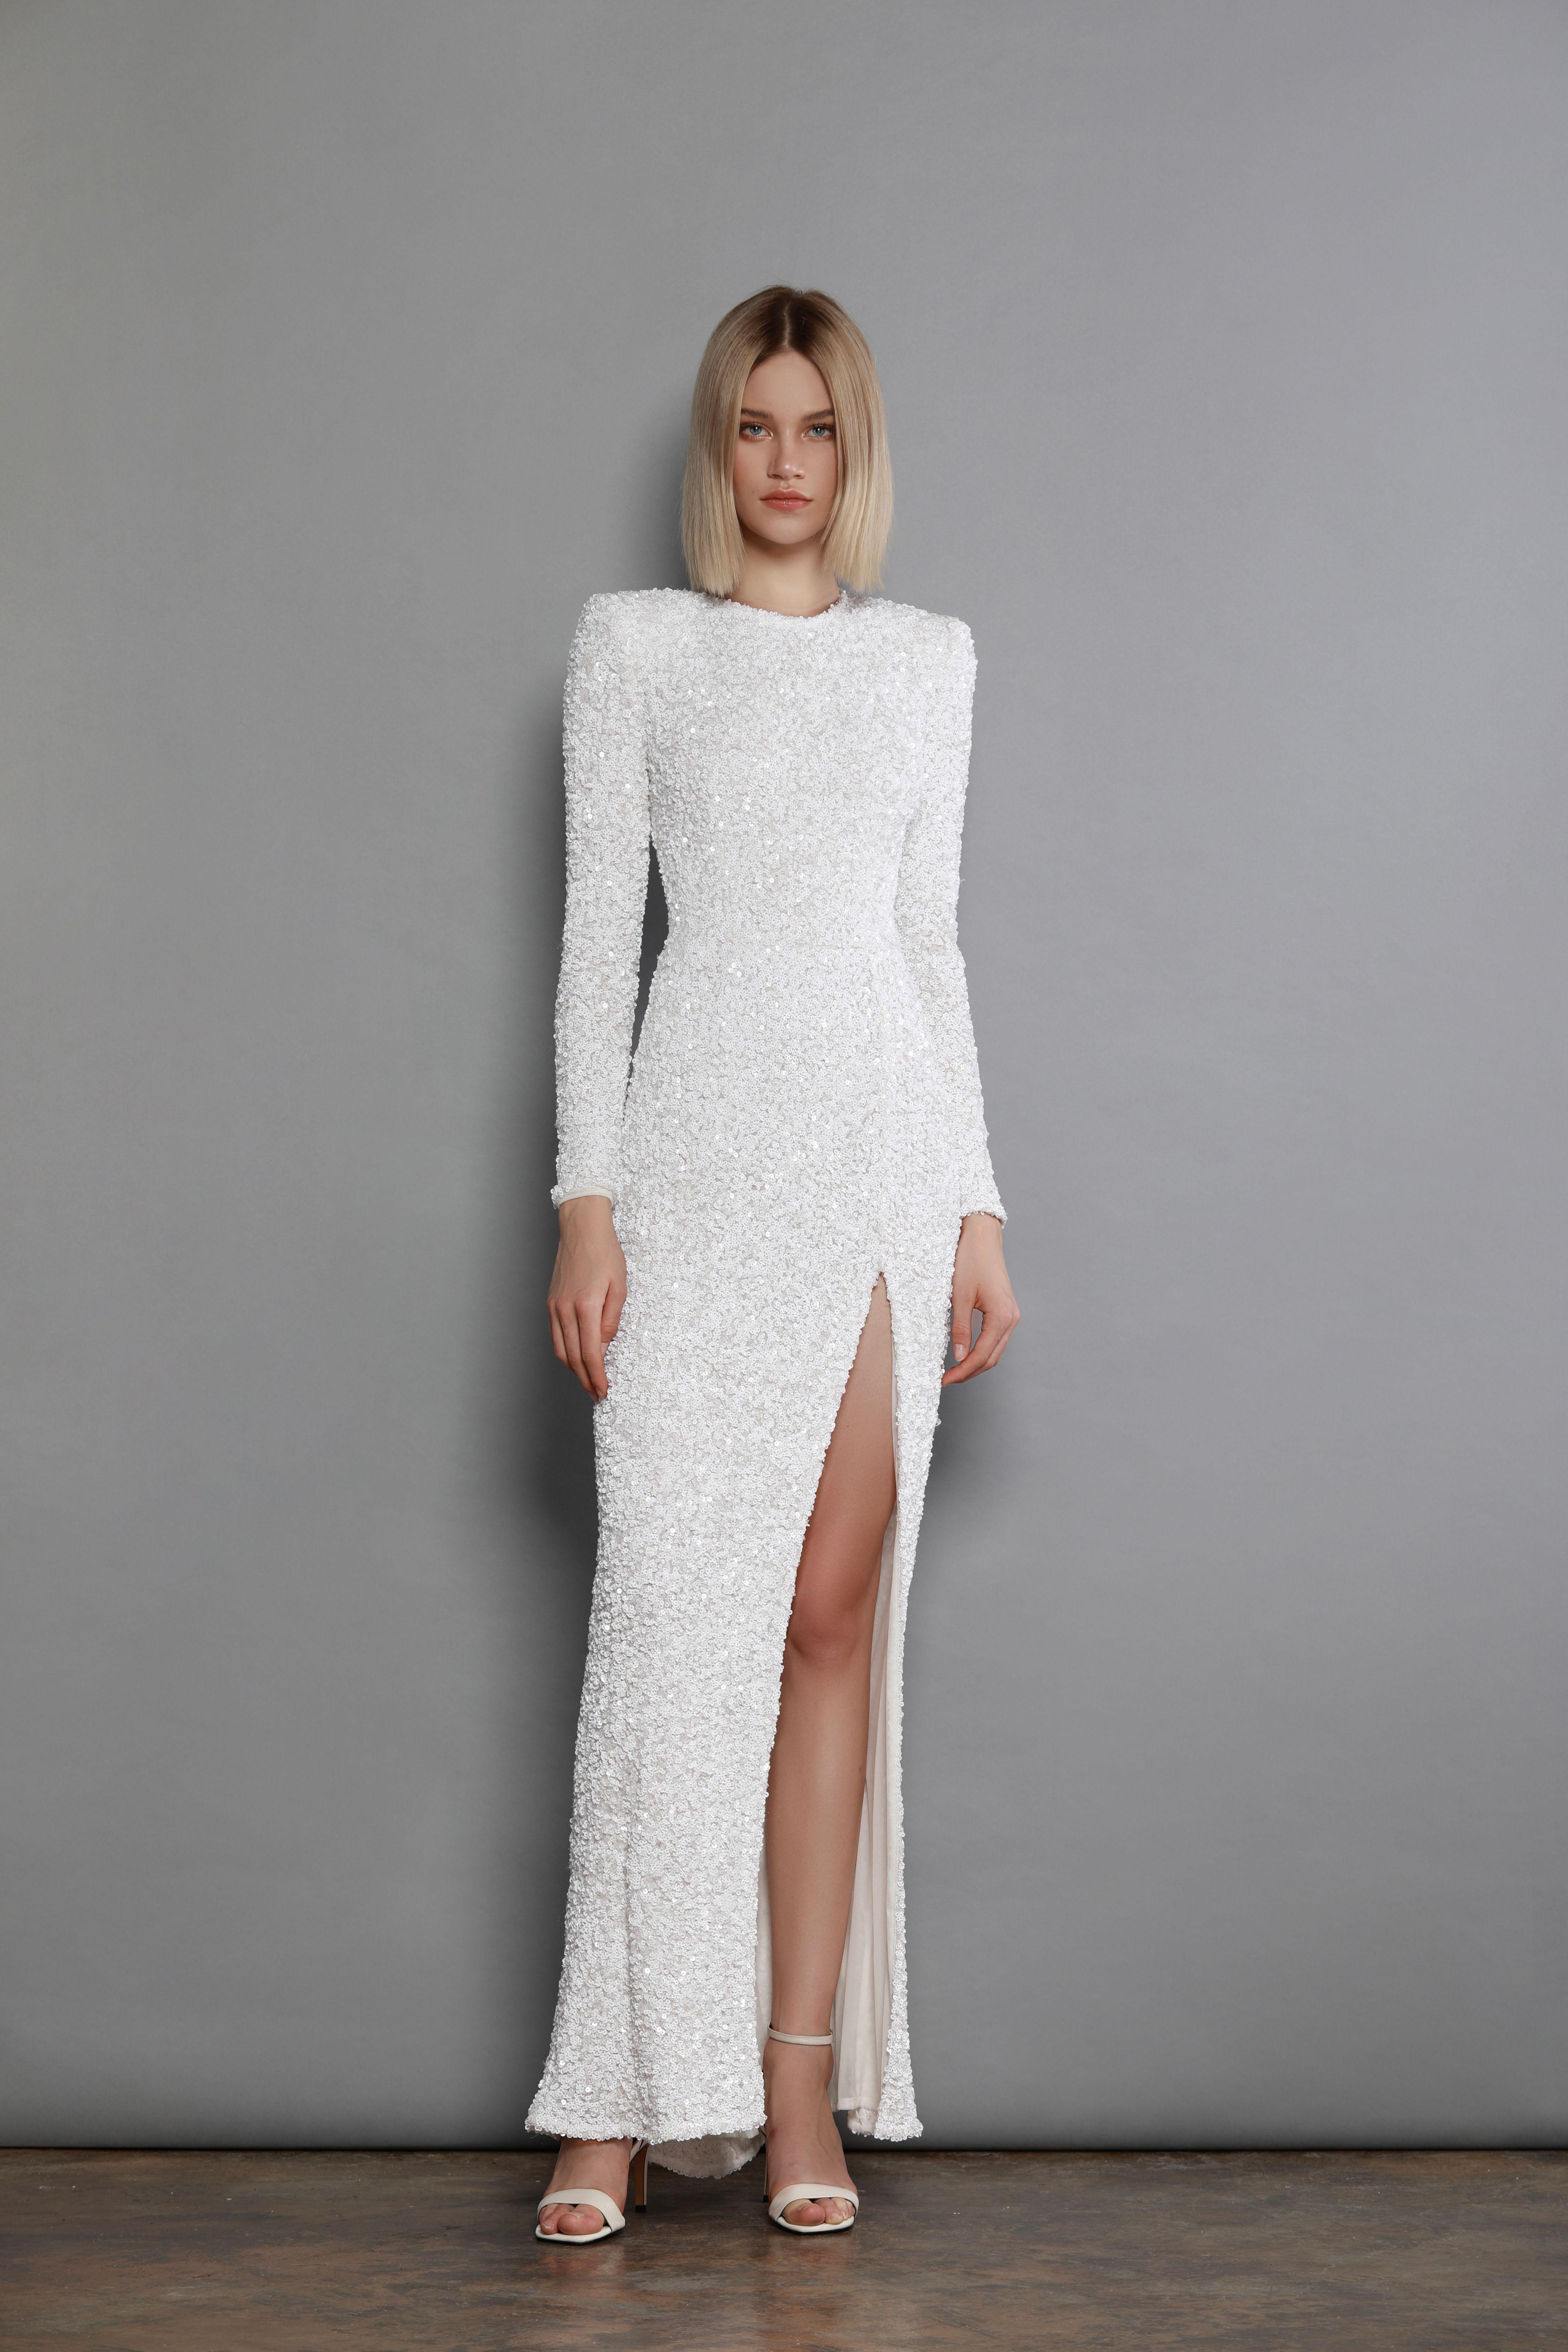 Elizabeth Blanc Dress Bronx And Banco White Long Sleeve Dress Simple Long White Dress Simple Long Sleeve Dress [ 6720 x 4480 Pixel ]